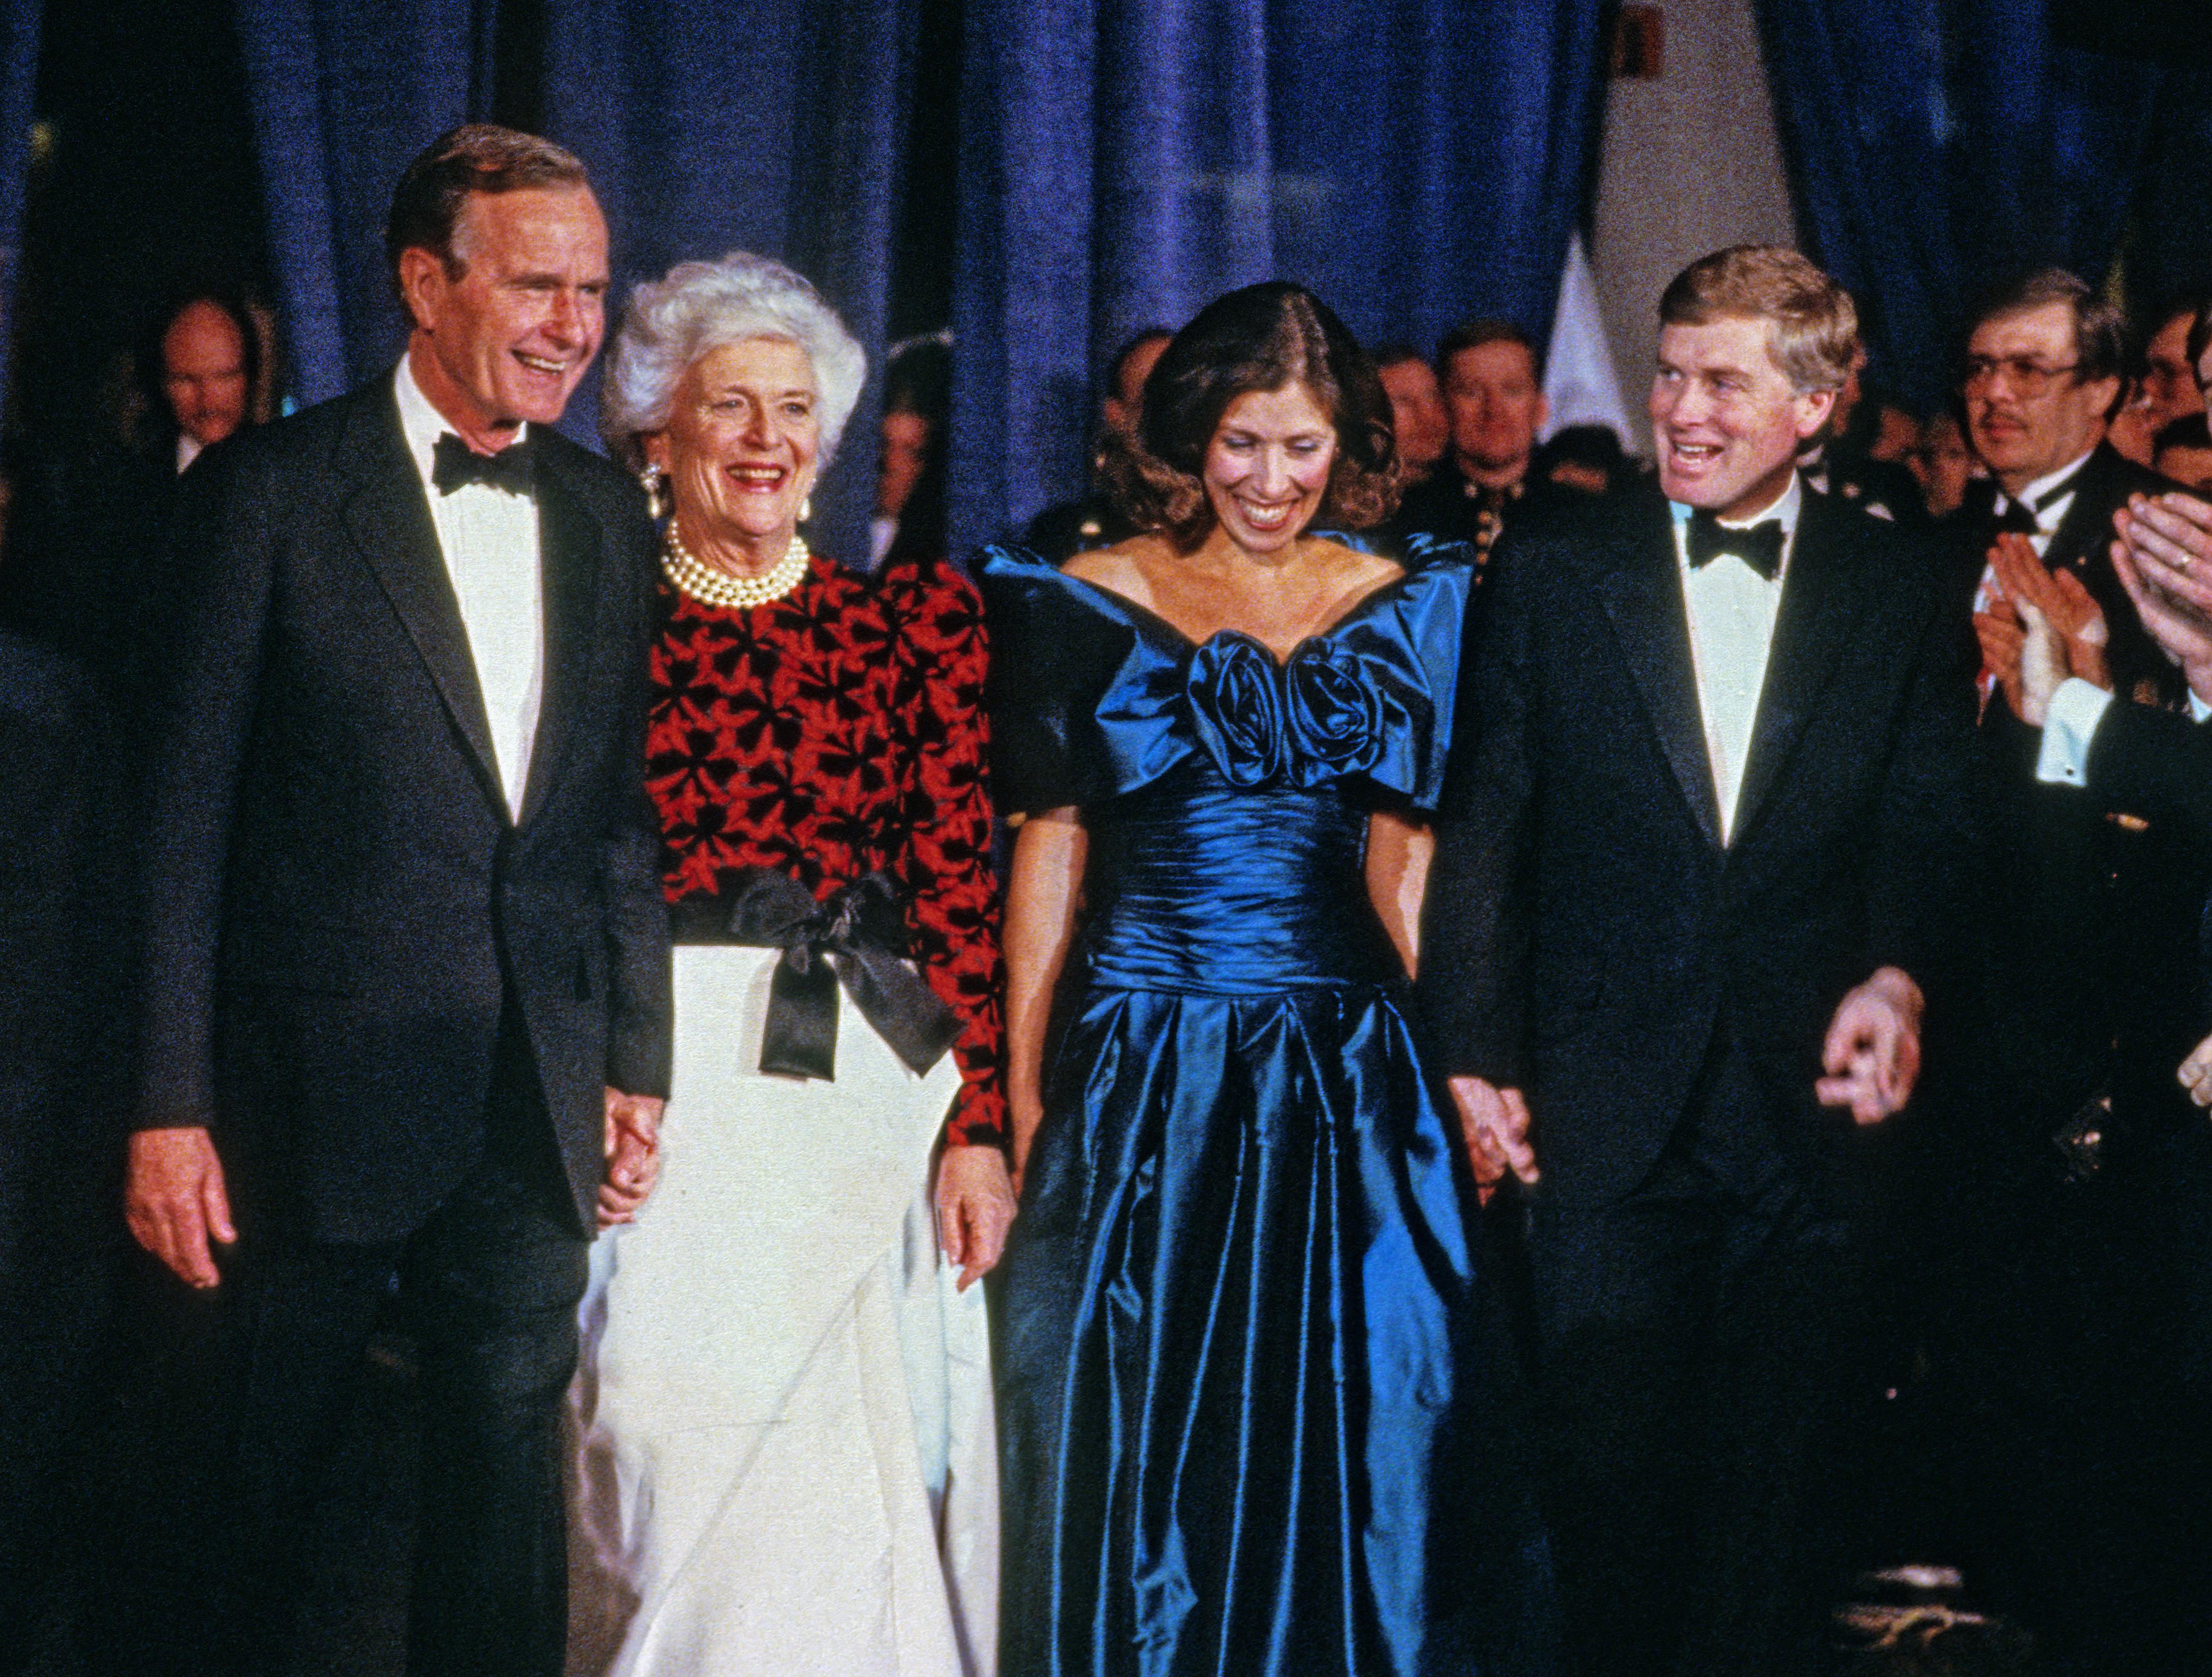 Bush-Quayle Inauguration Ball